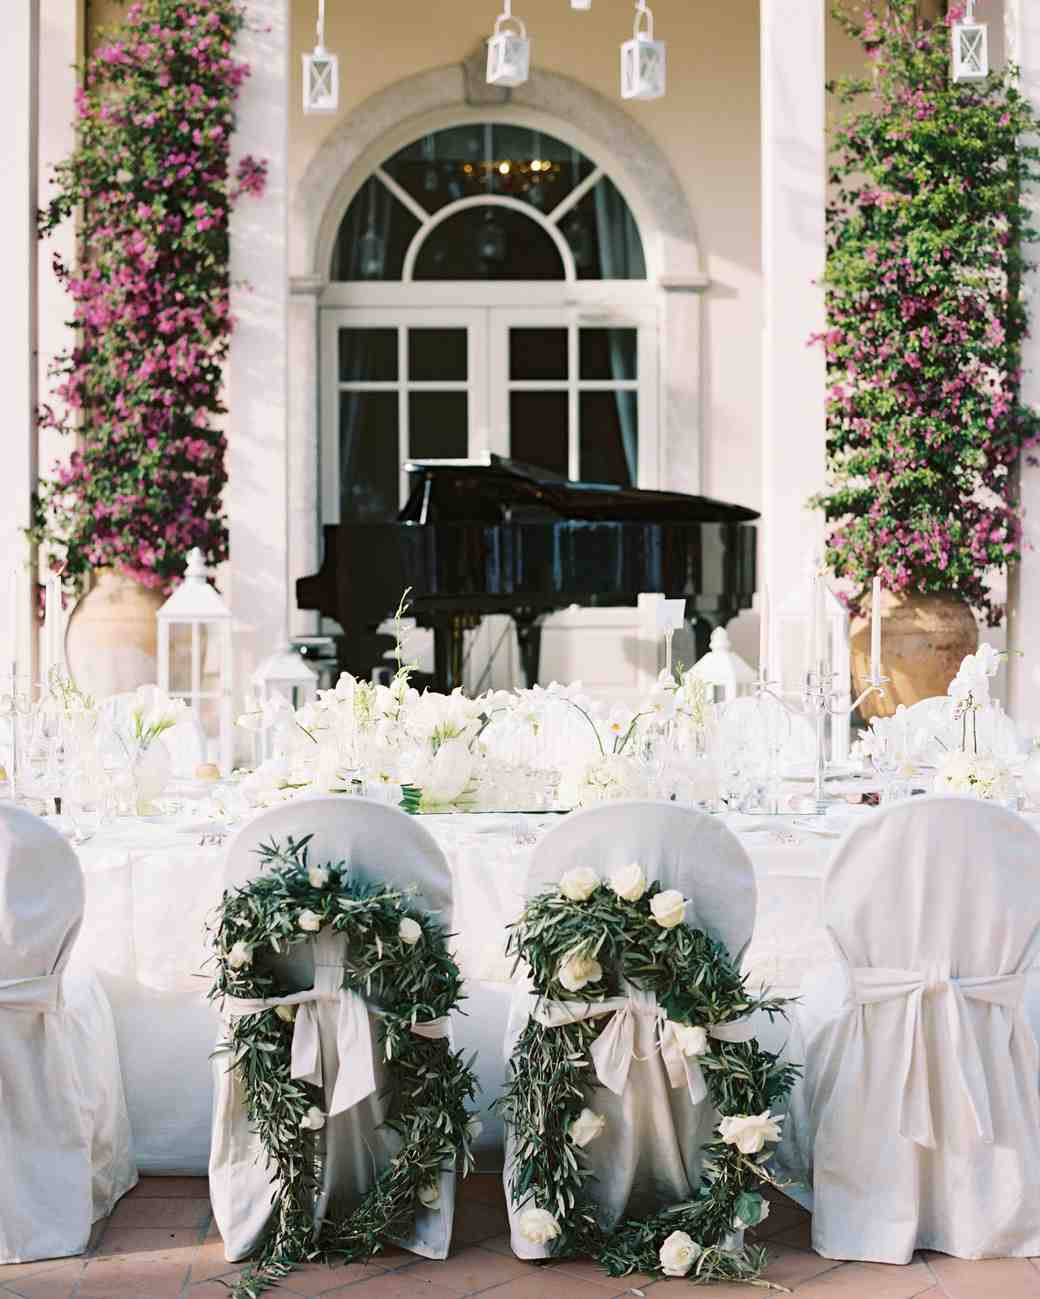 32 inch vases wholesale of 79 white wedding centerpieces martha stewart weddings in reception chairs